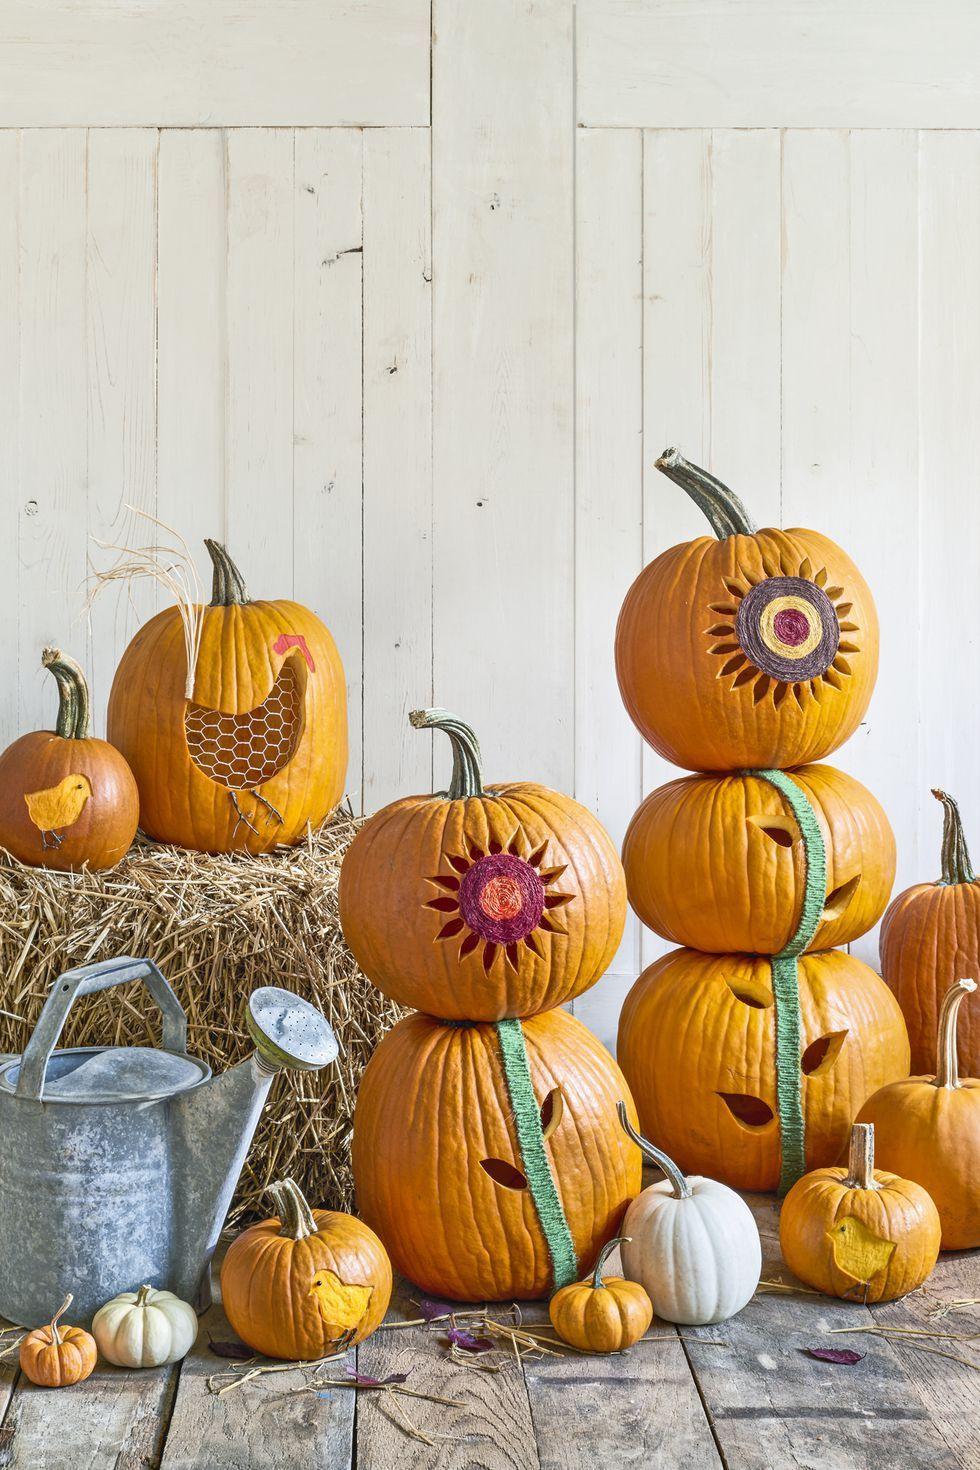 25+ Easy Pumpkin Carving Ideas for Halloween Creative